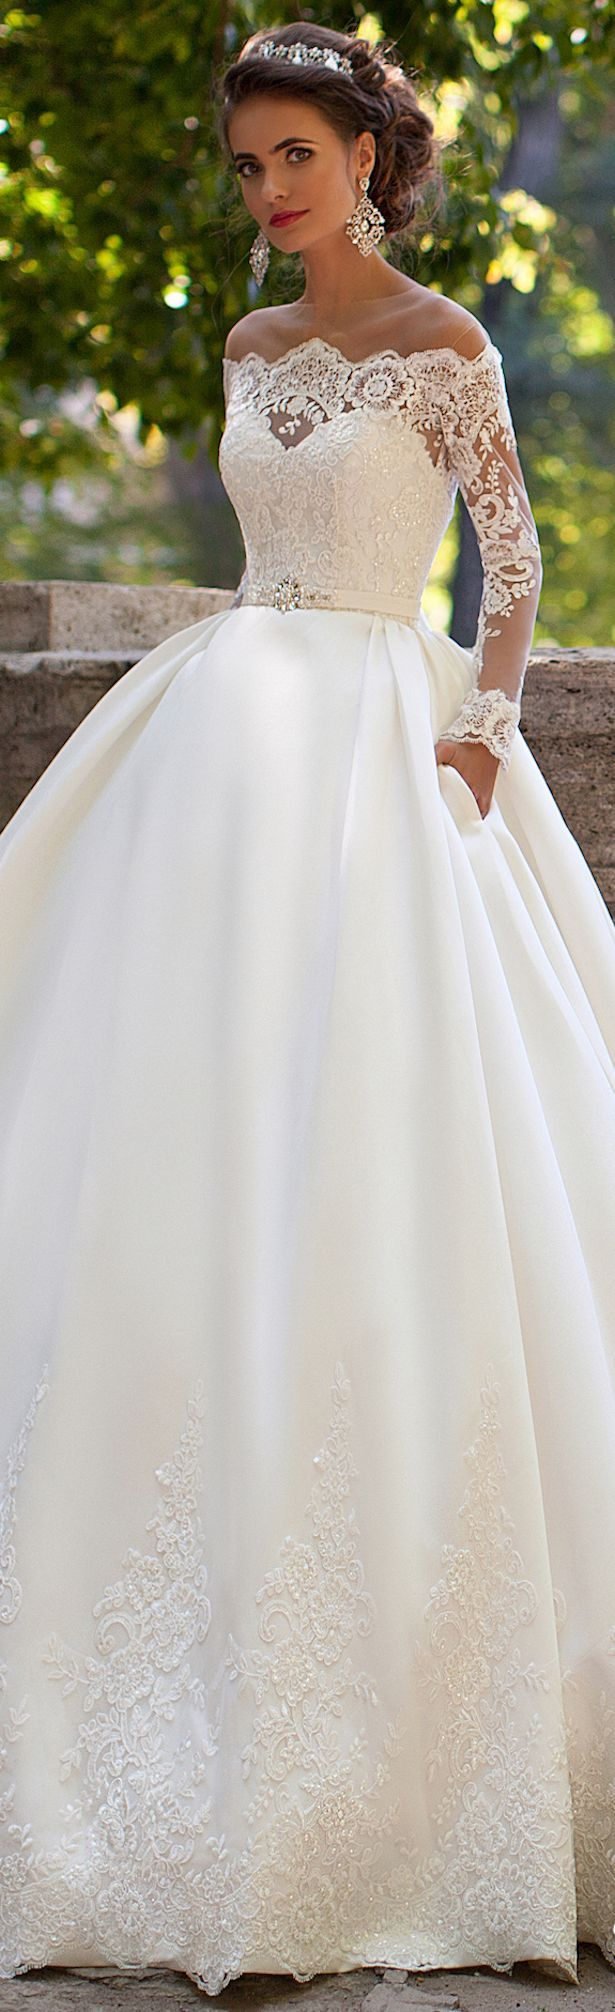 Milla Nova 2016 Bridal Collection - wauw de onderkant is prachtig!